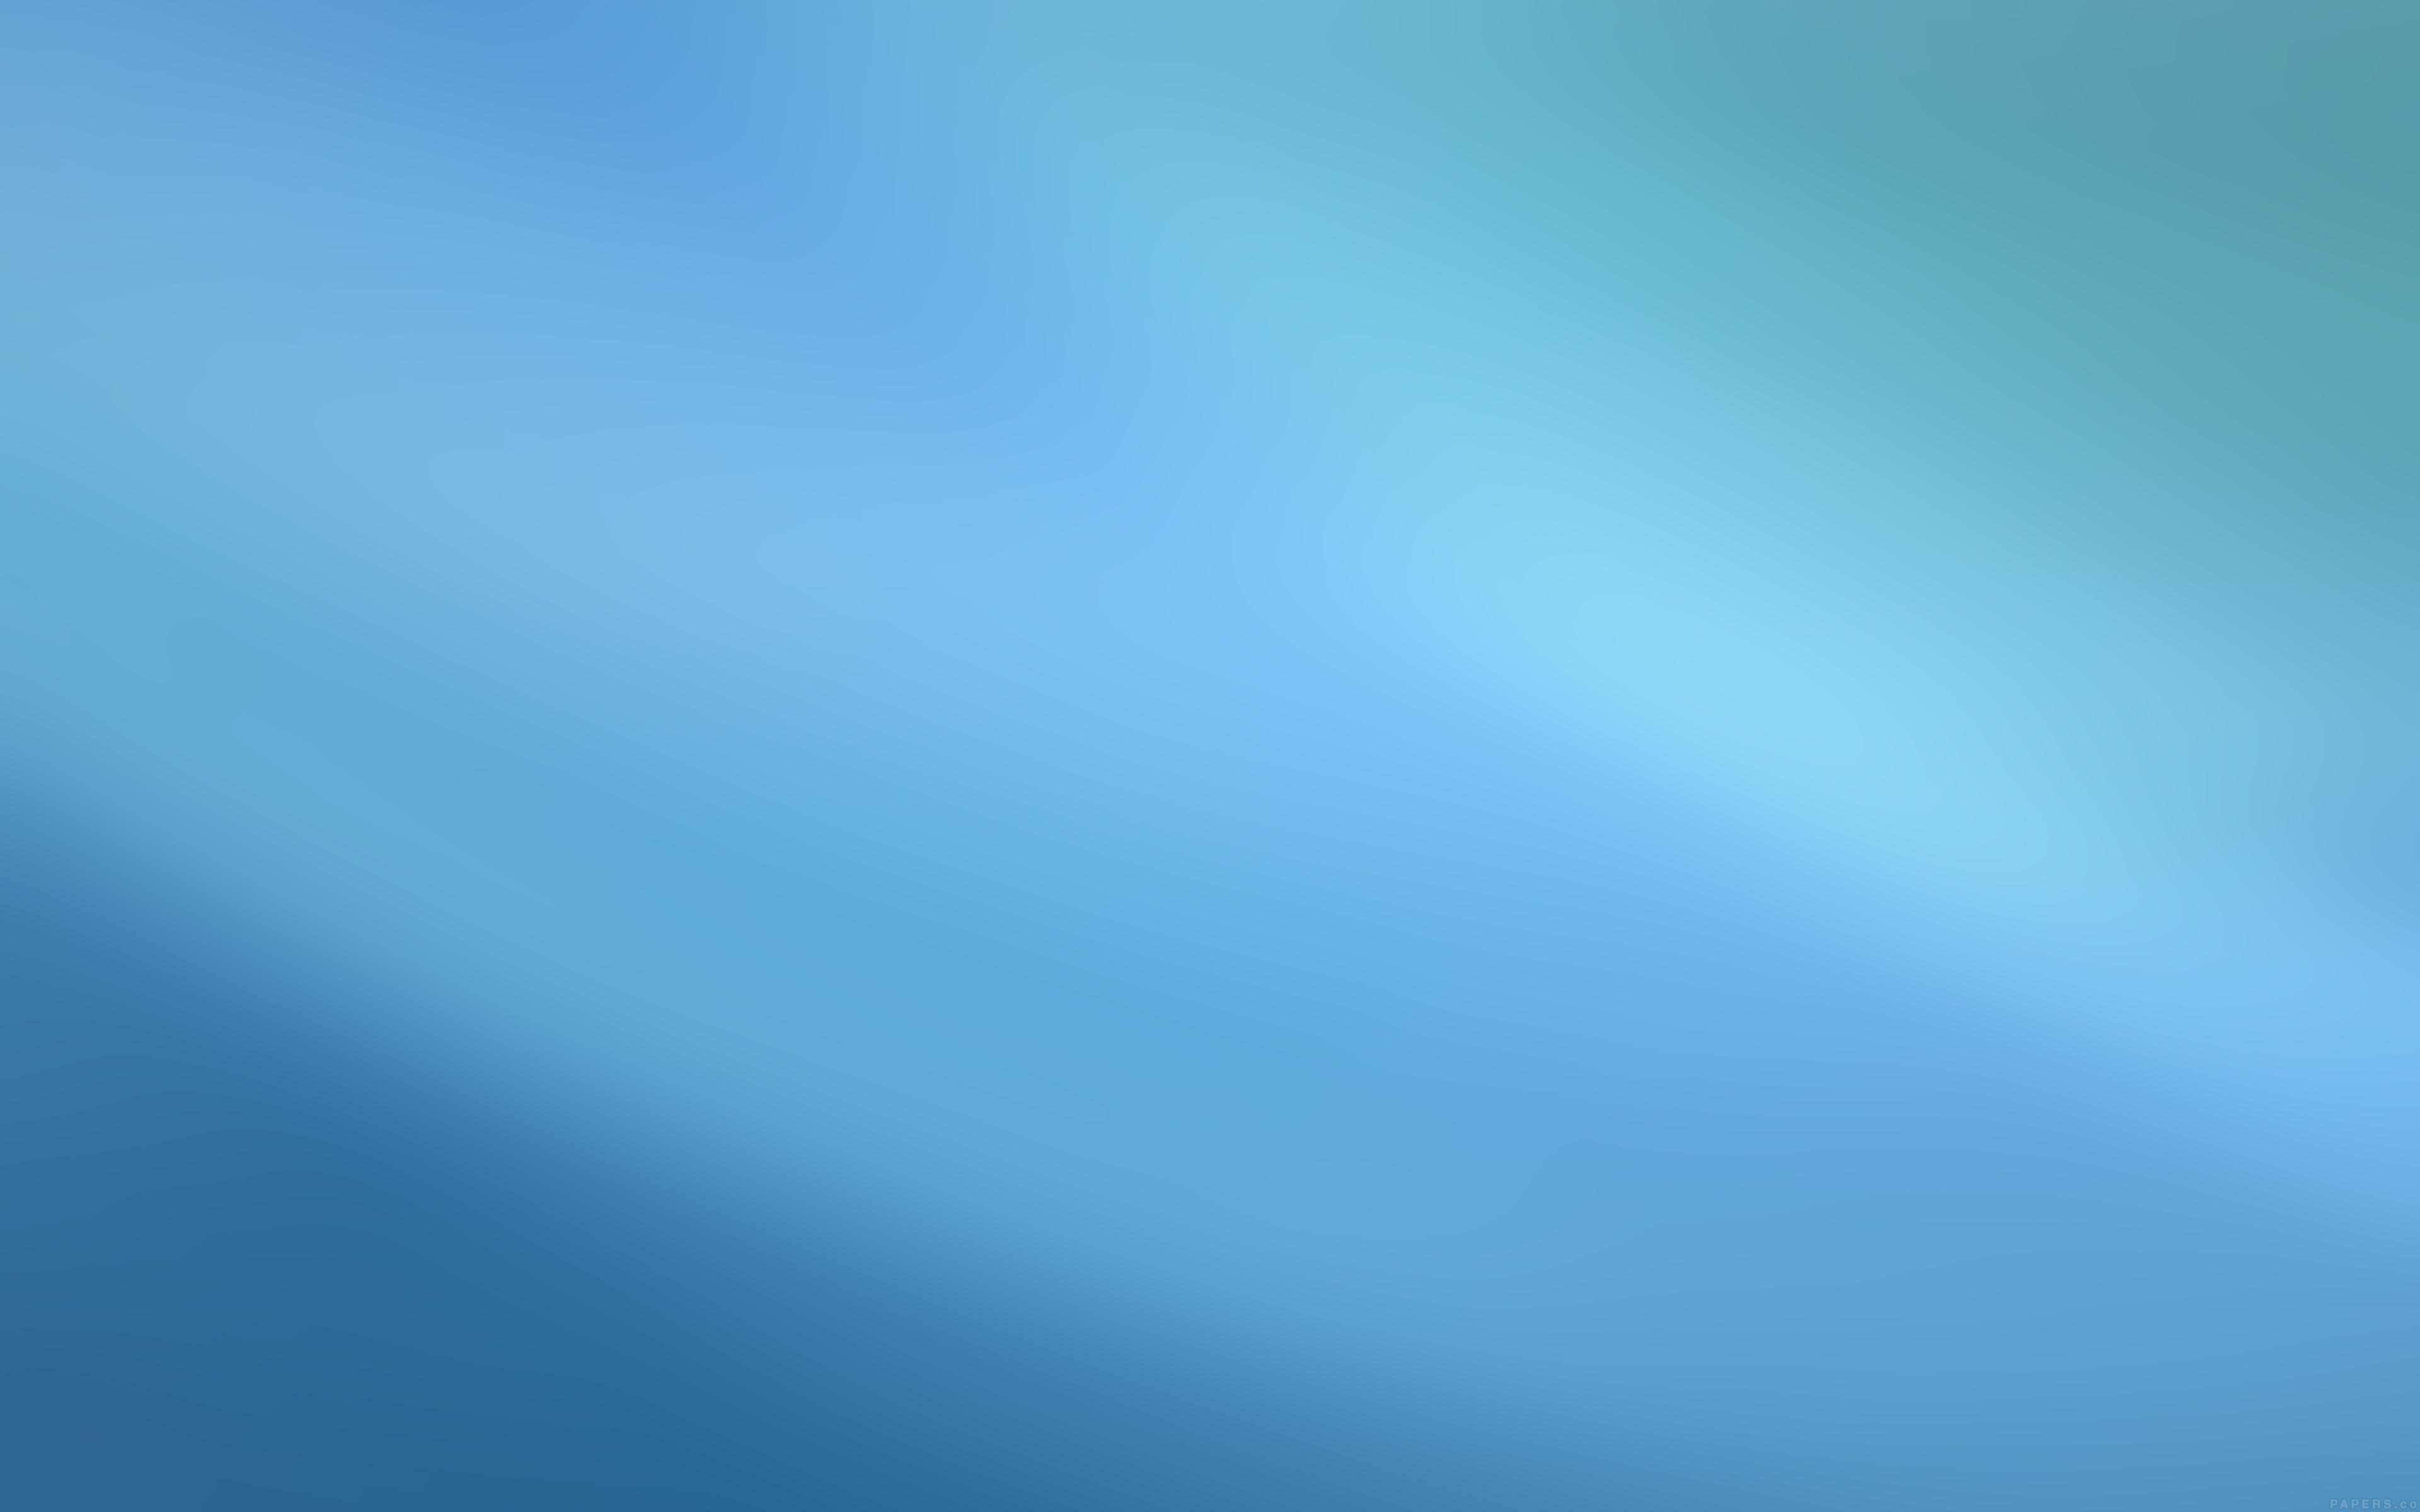 Se92-light-blue-love-gradation-blur